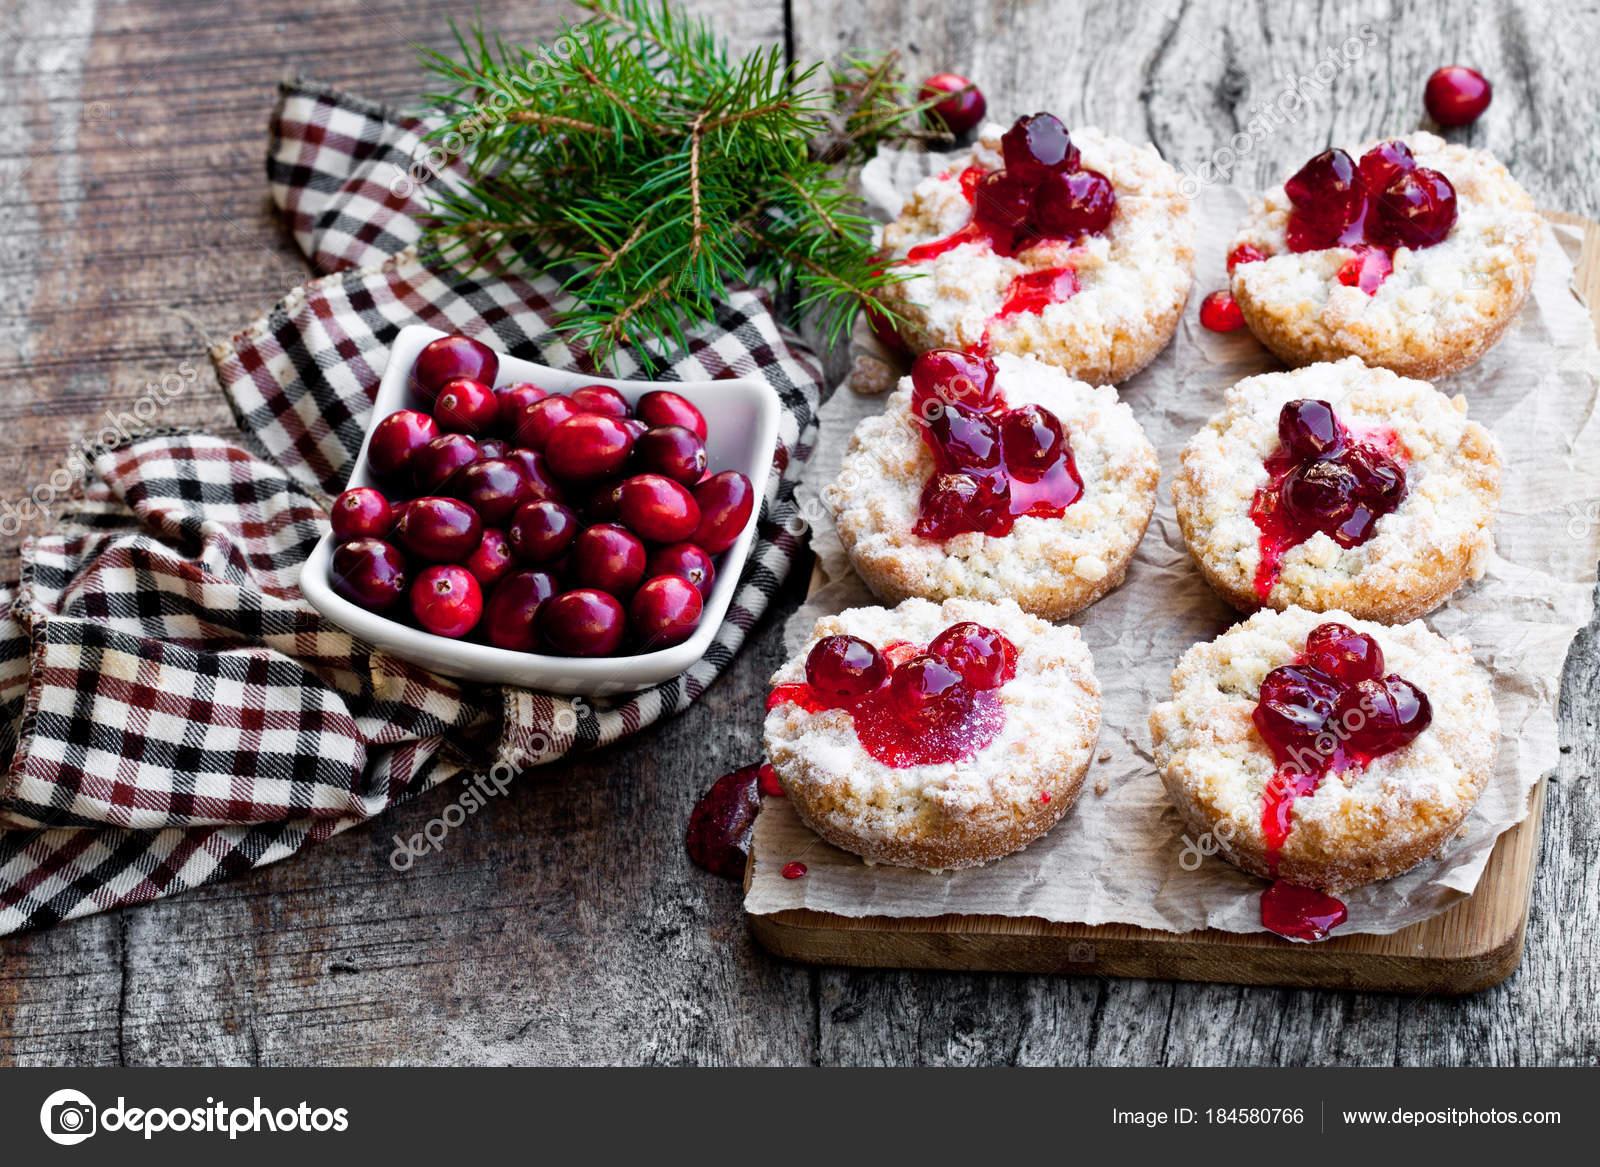 fruit dessert kerst